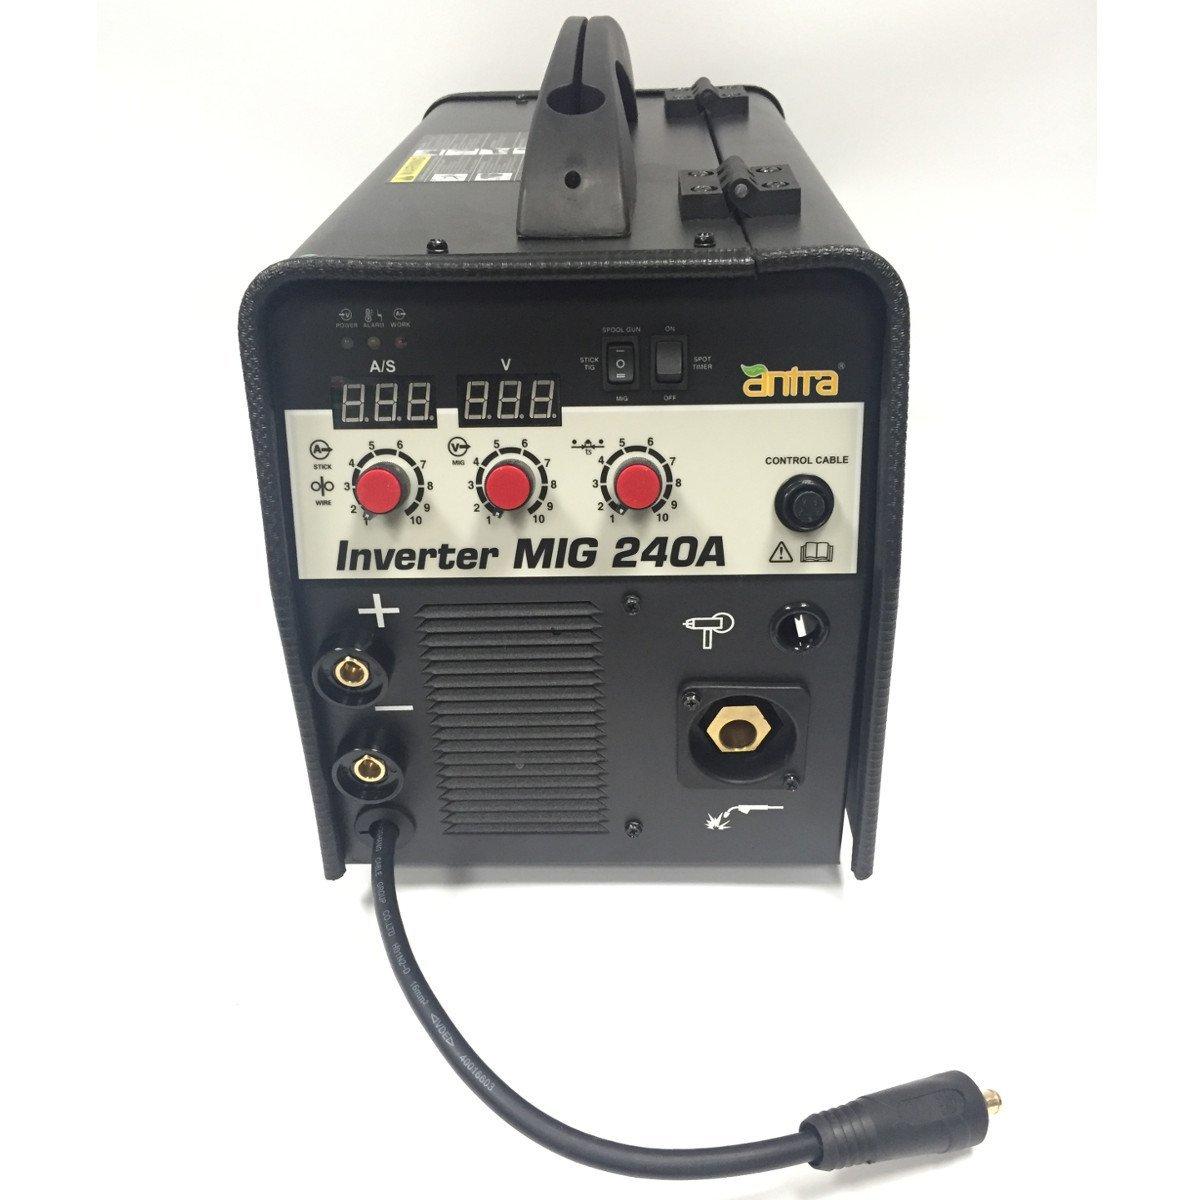 3 in 1 Antra MIG240A TIG/MIG/MMA Inverter Welding Machine Welder Spool Gun Compatible With Regulator included